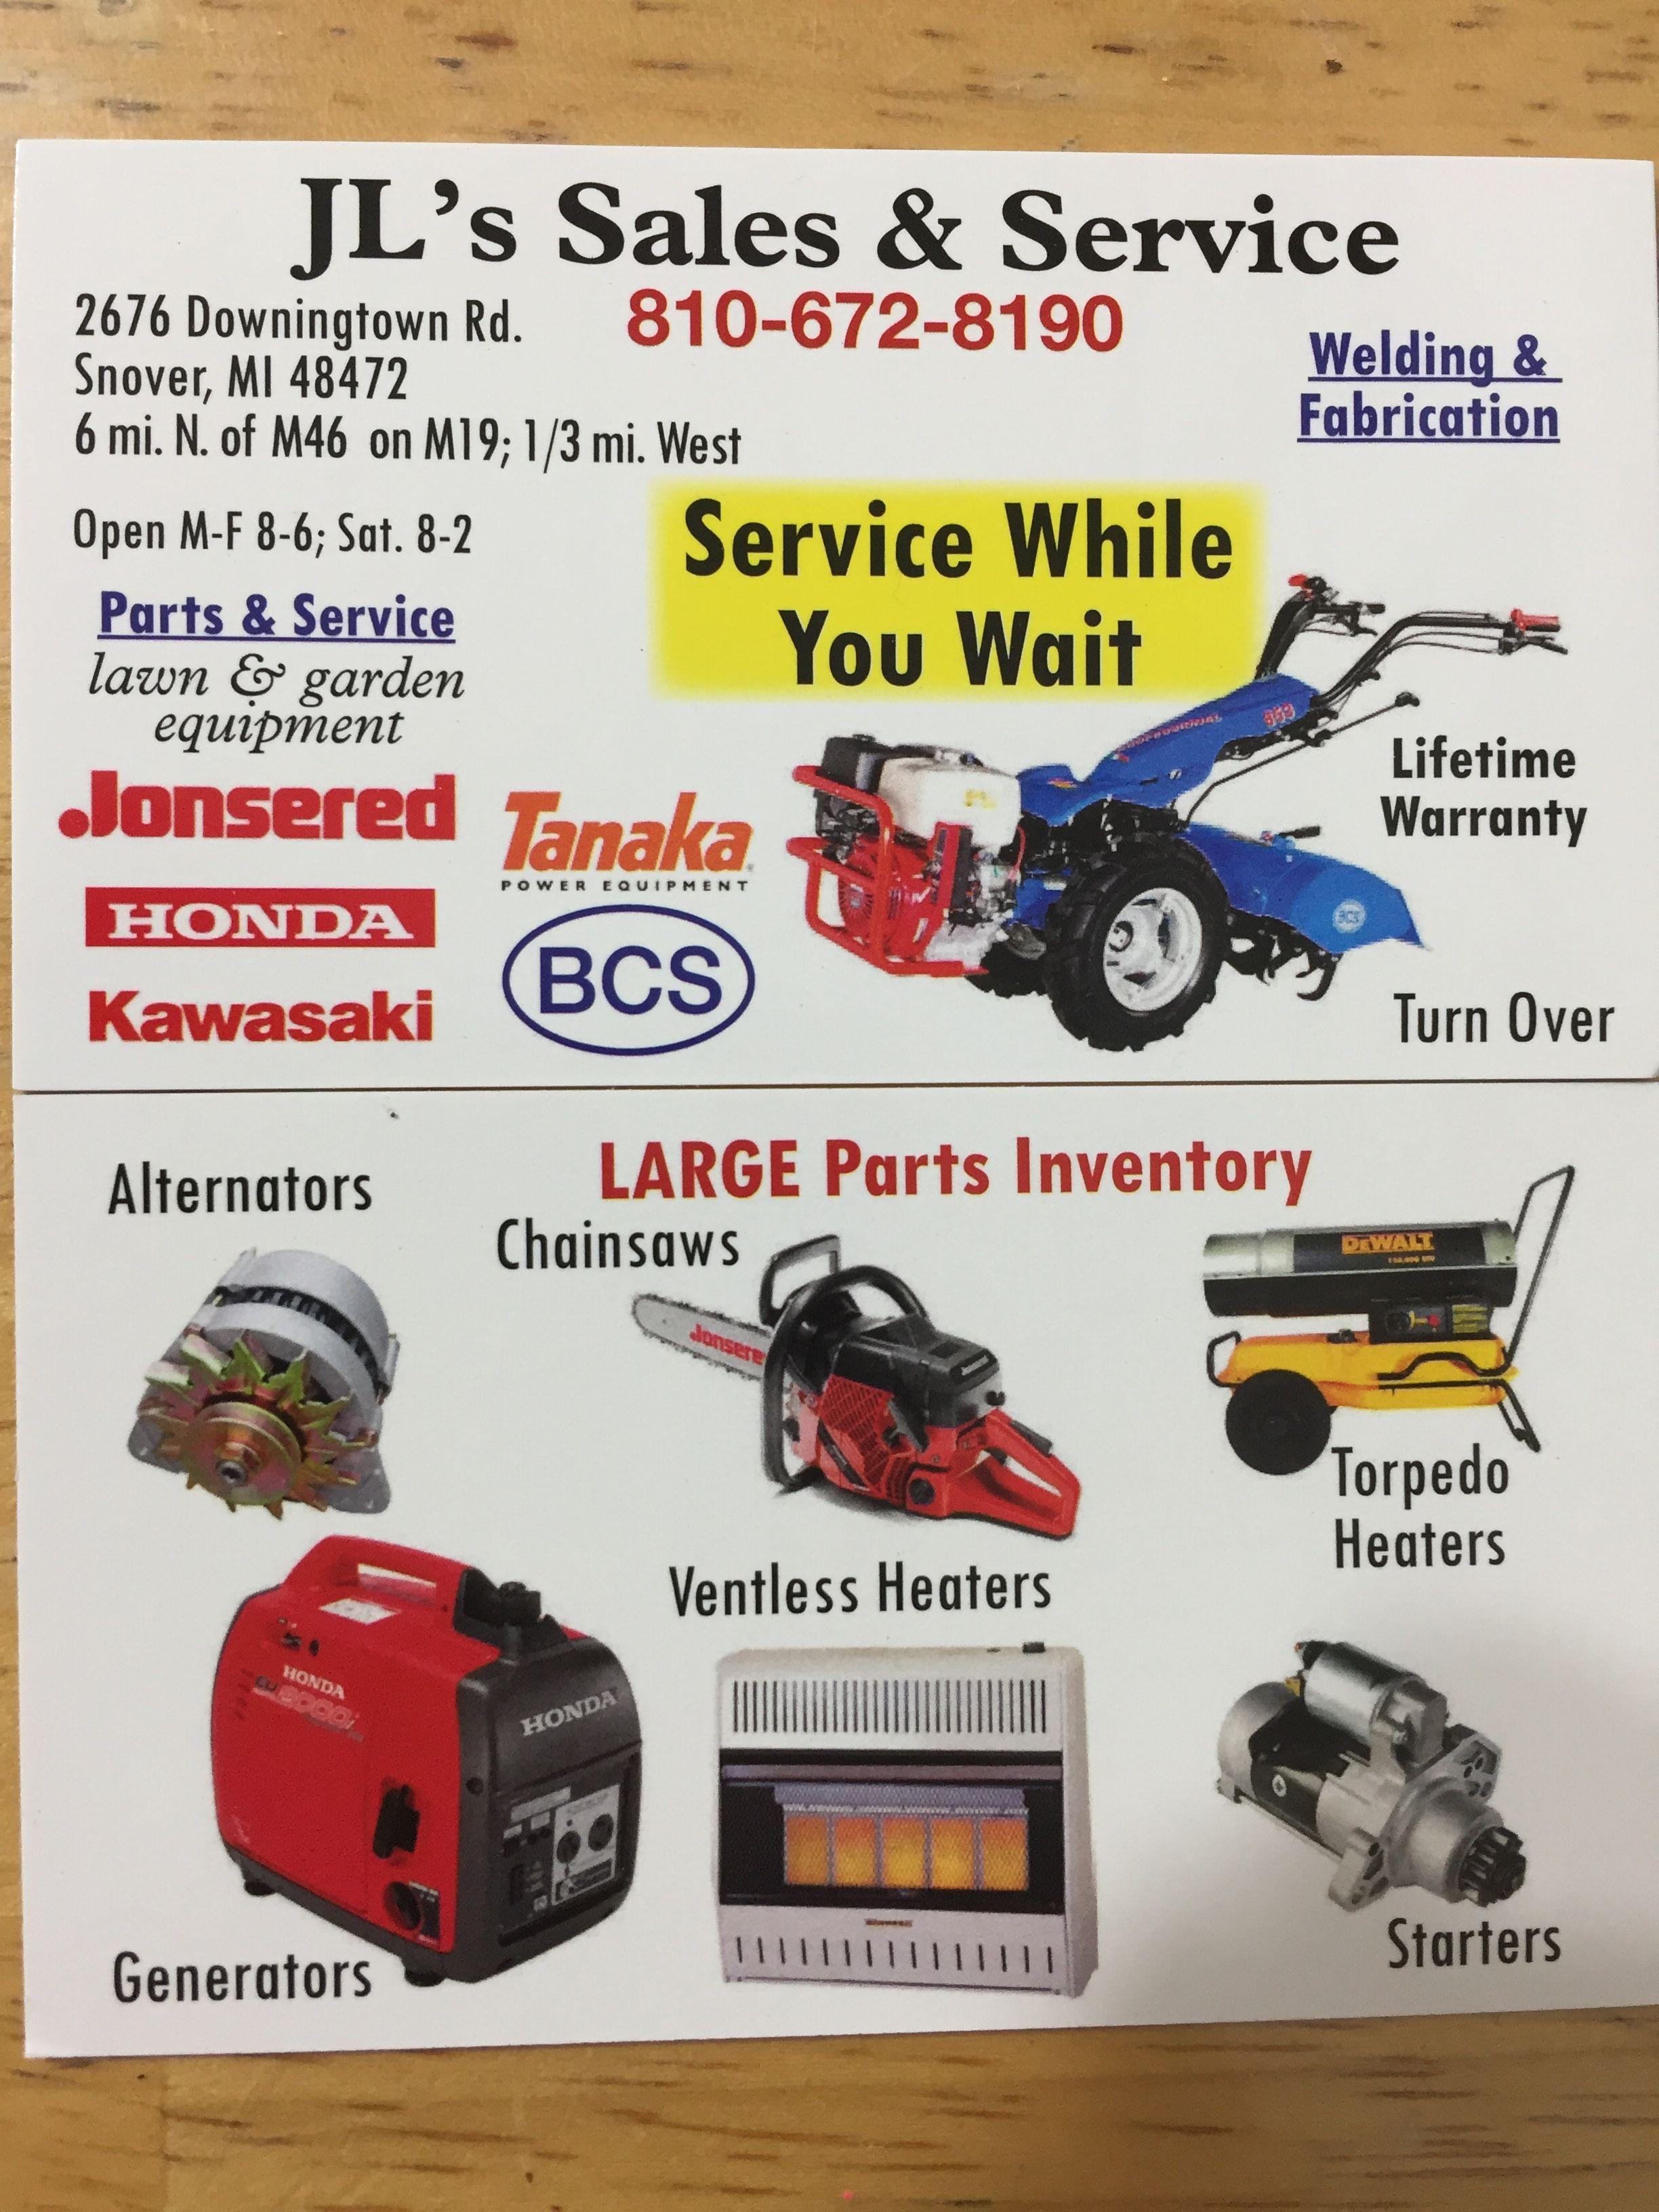 Pin di jls sales service su gardening